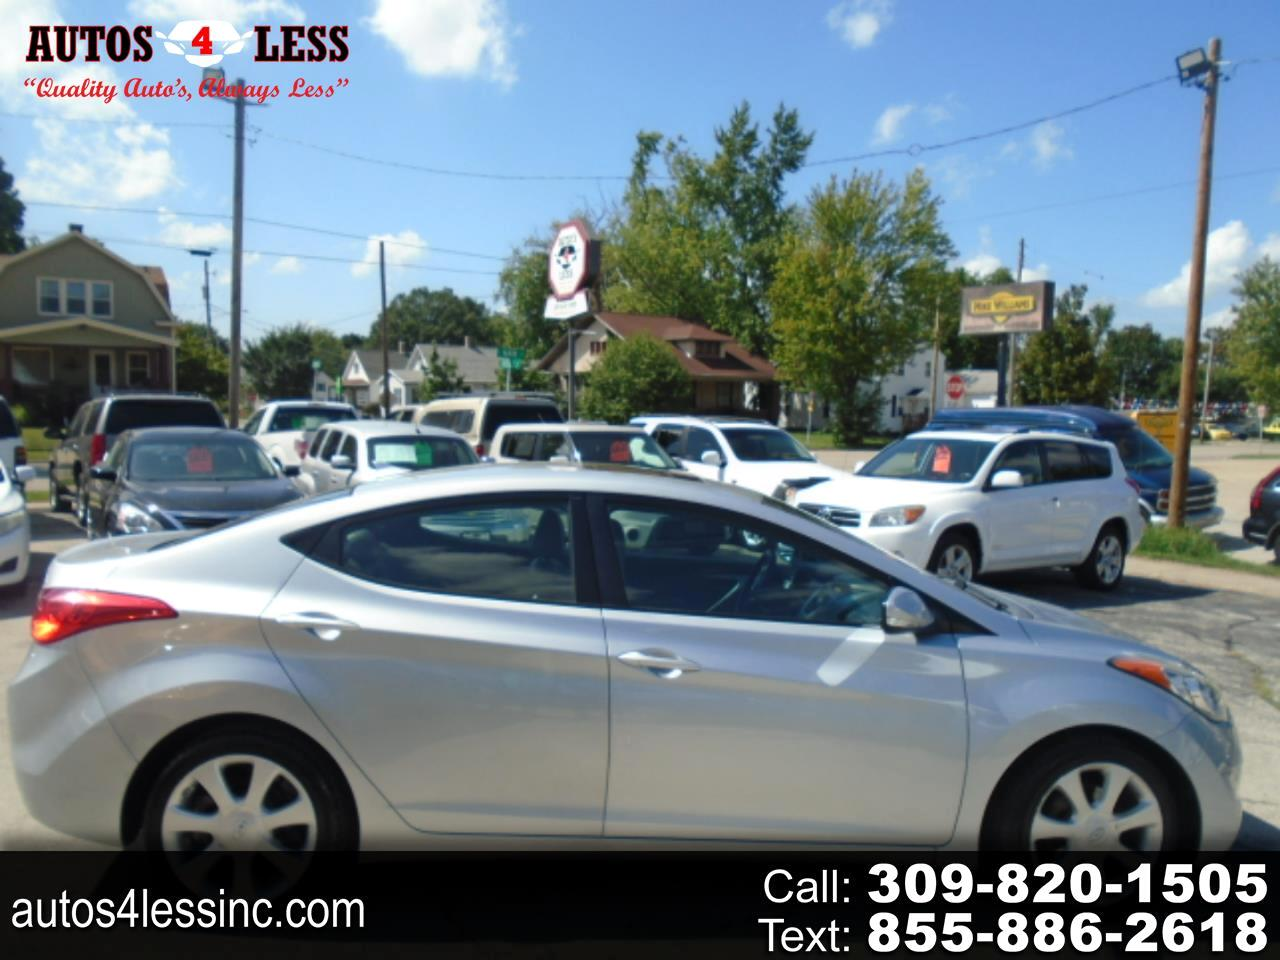 Hyundai Elantra 4dr Sdn Auto Limited (Alabama Plant) 2012